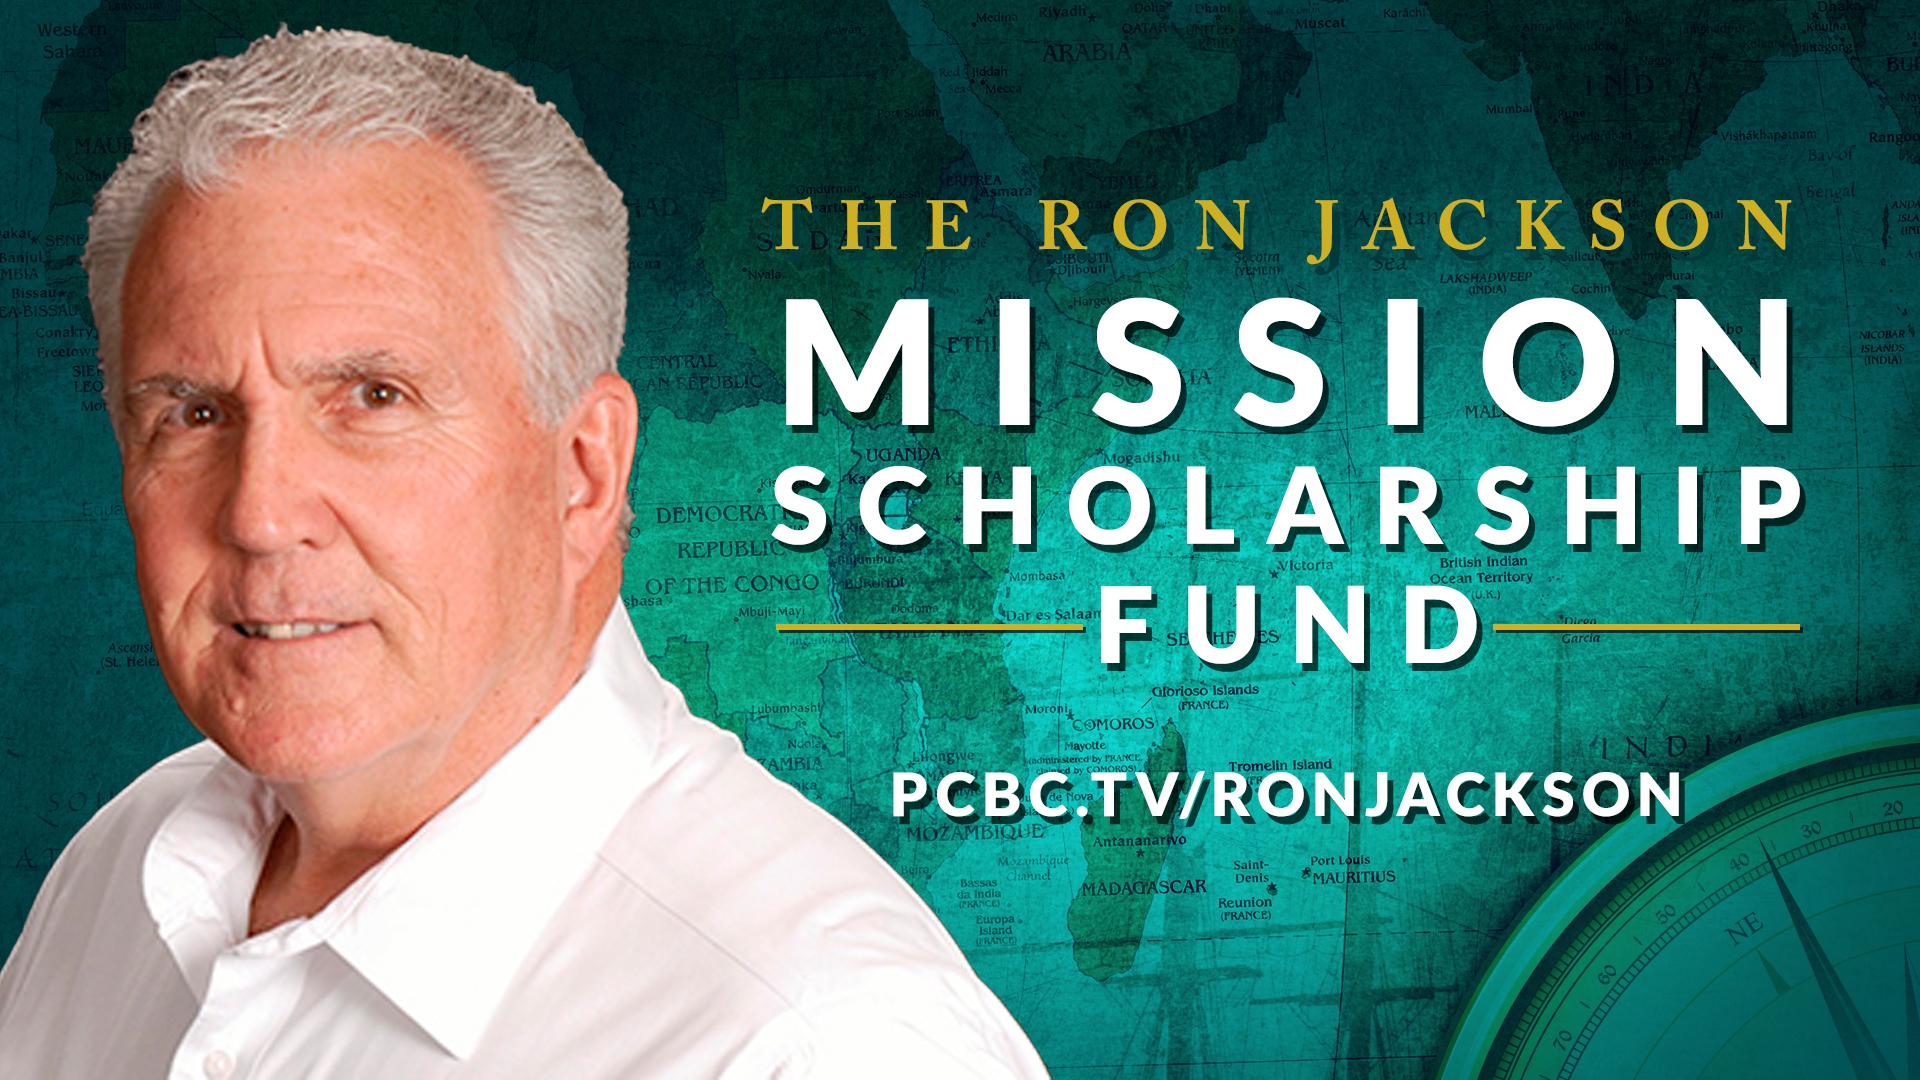 Ron-Jackson-Mission-Slide